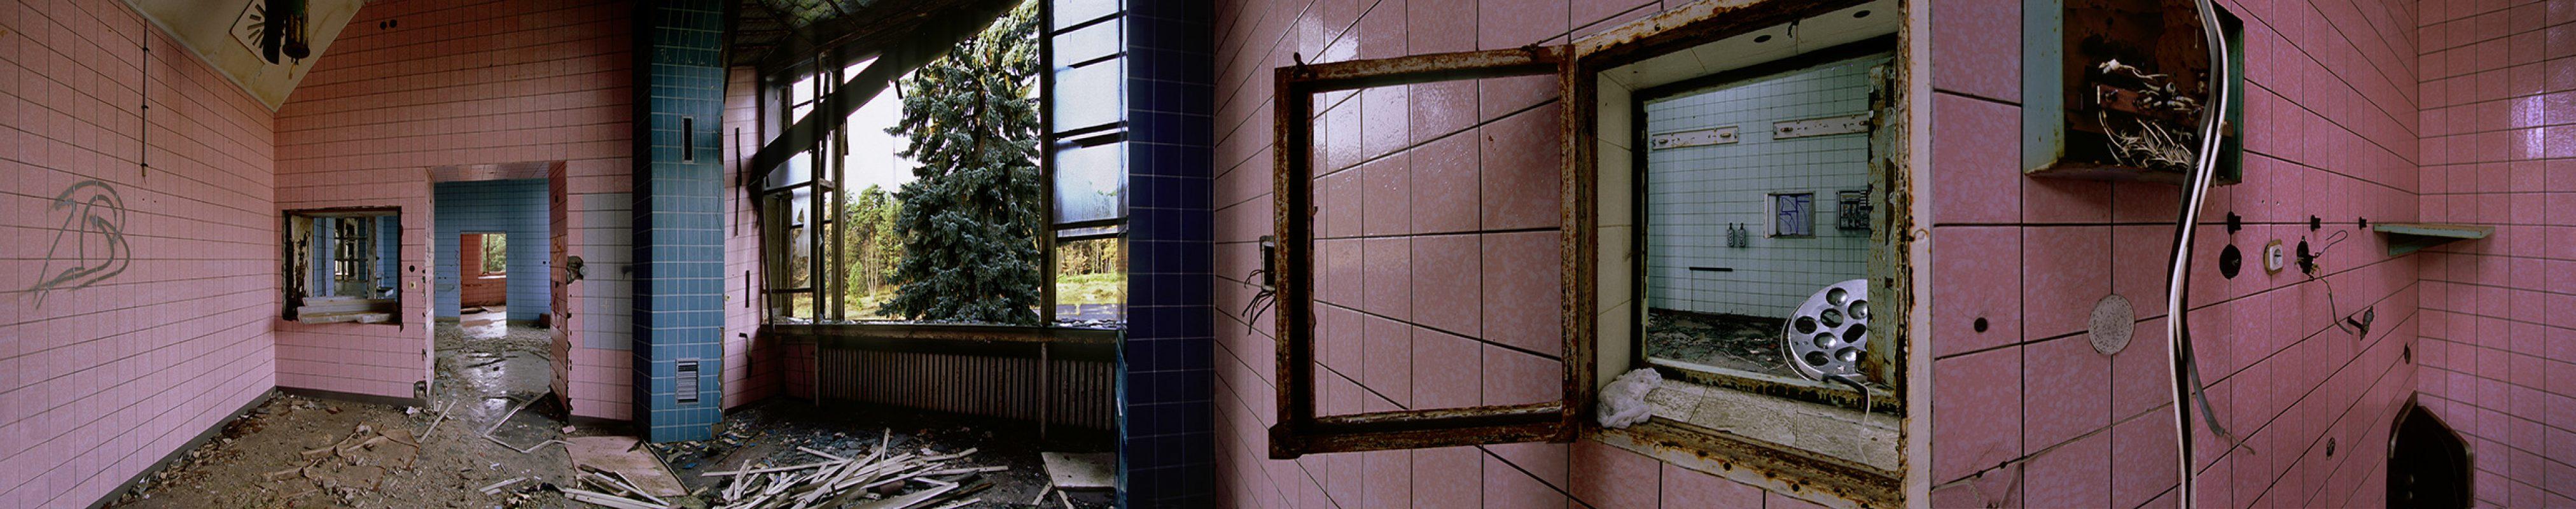 Beelitz-Heilstätten, Rosa Fliesen